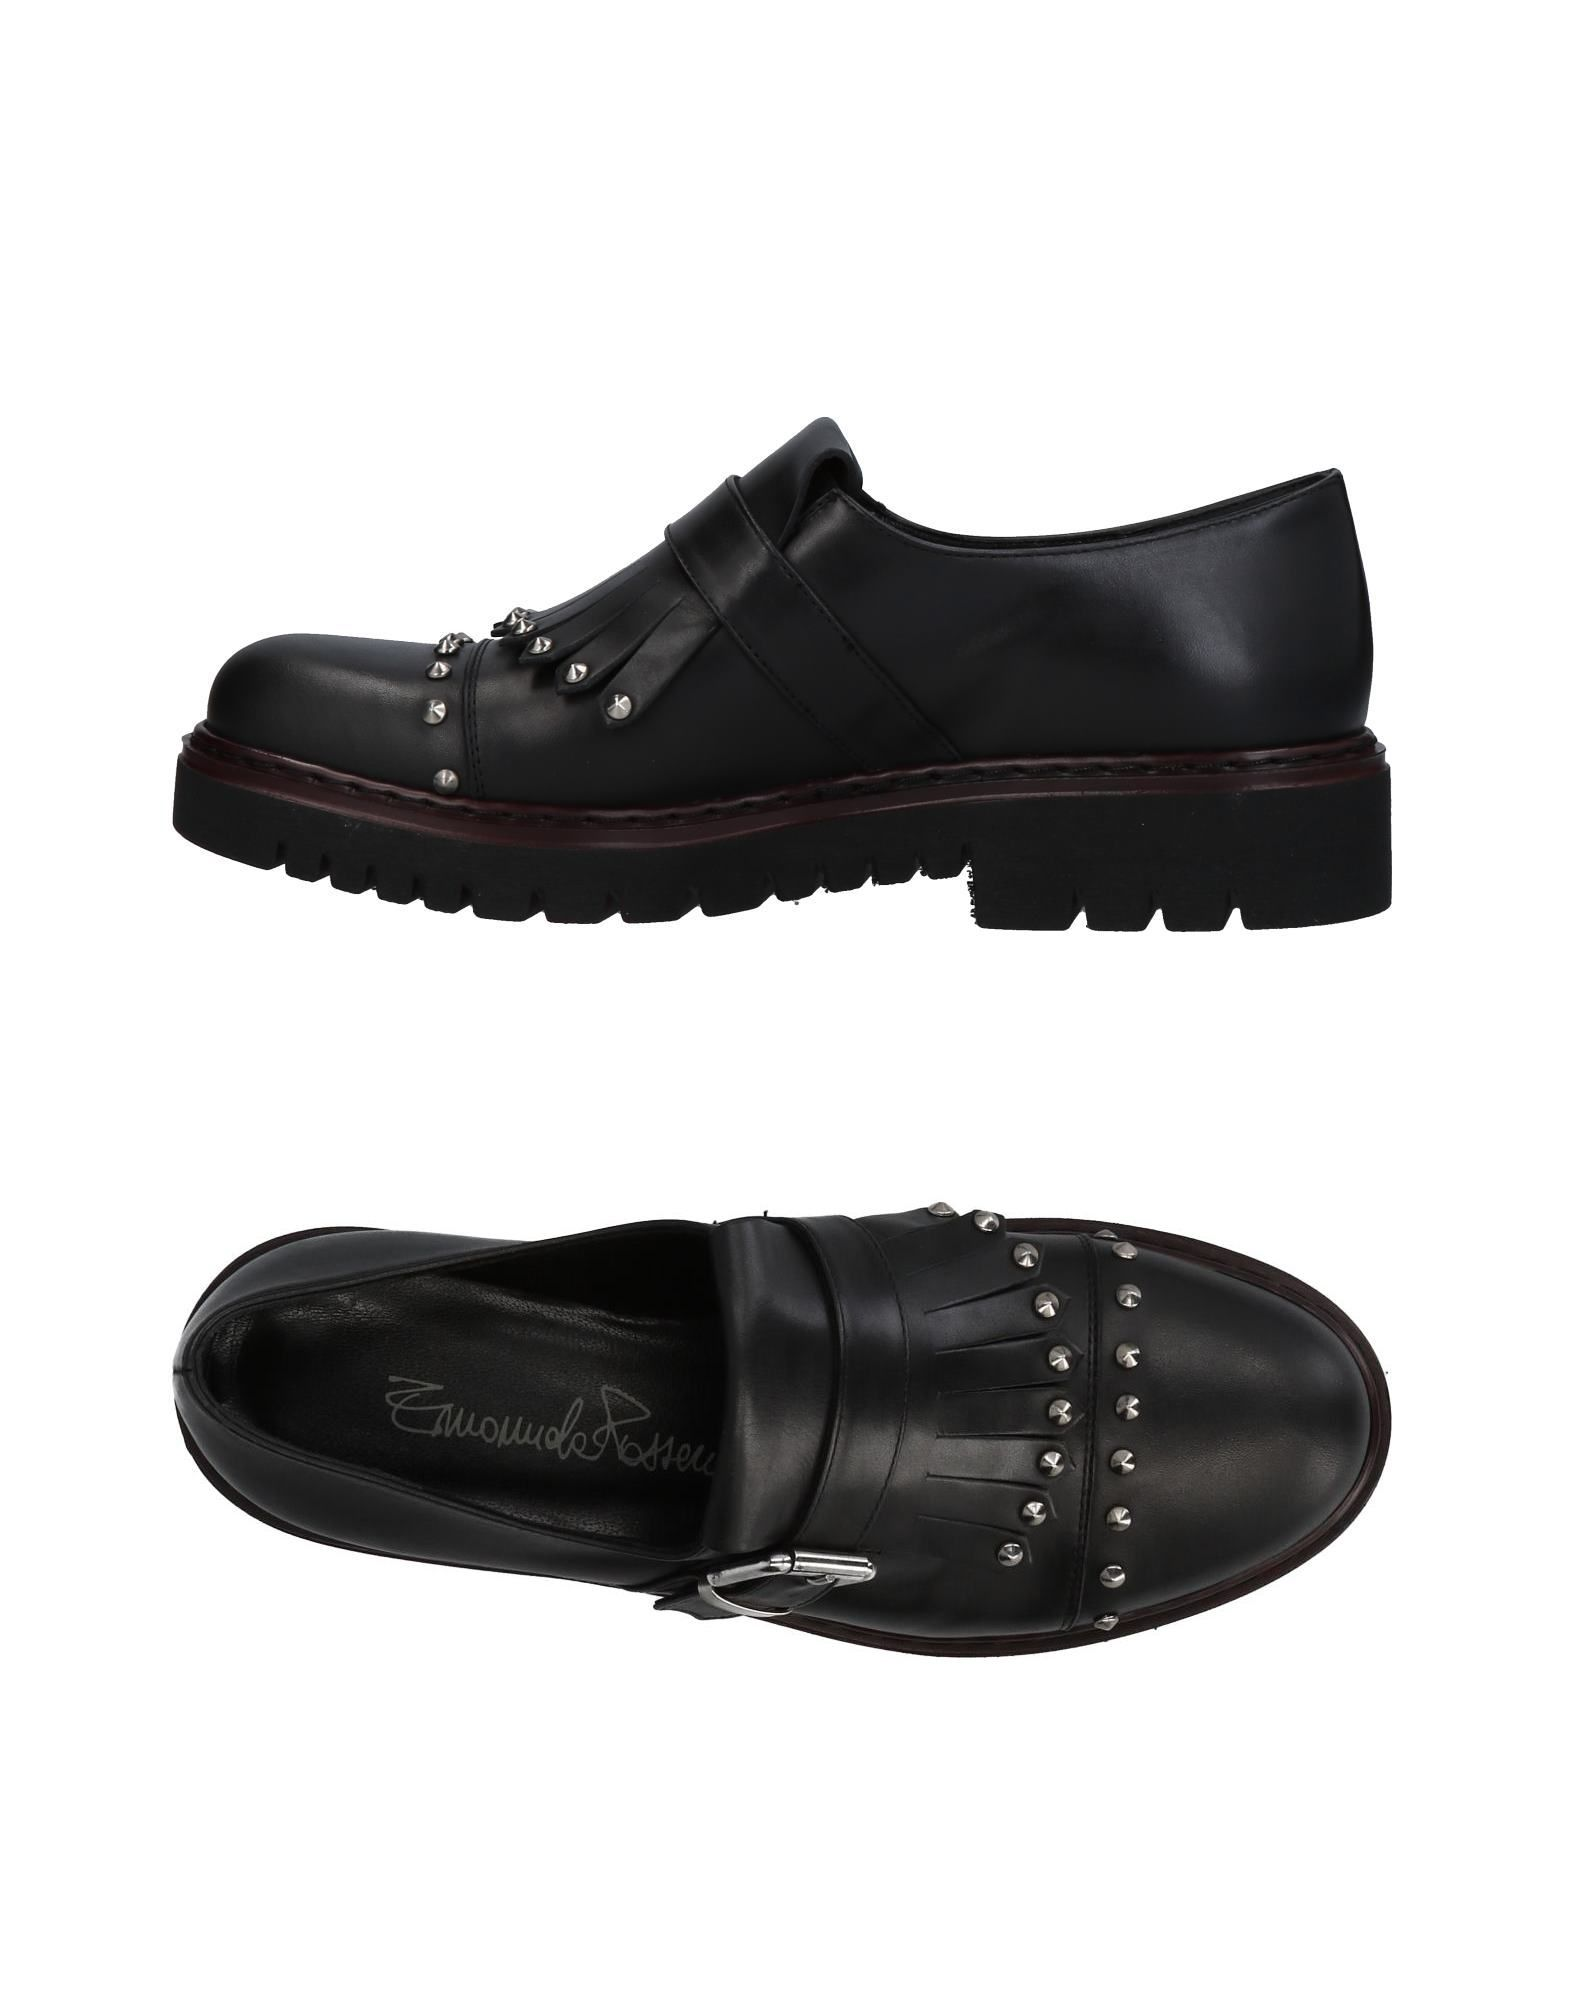 Emanuela Passeri Mokassins Damen  11444650CF Gute Qualität beliebte Schuhe